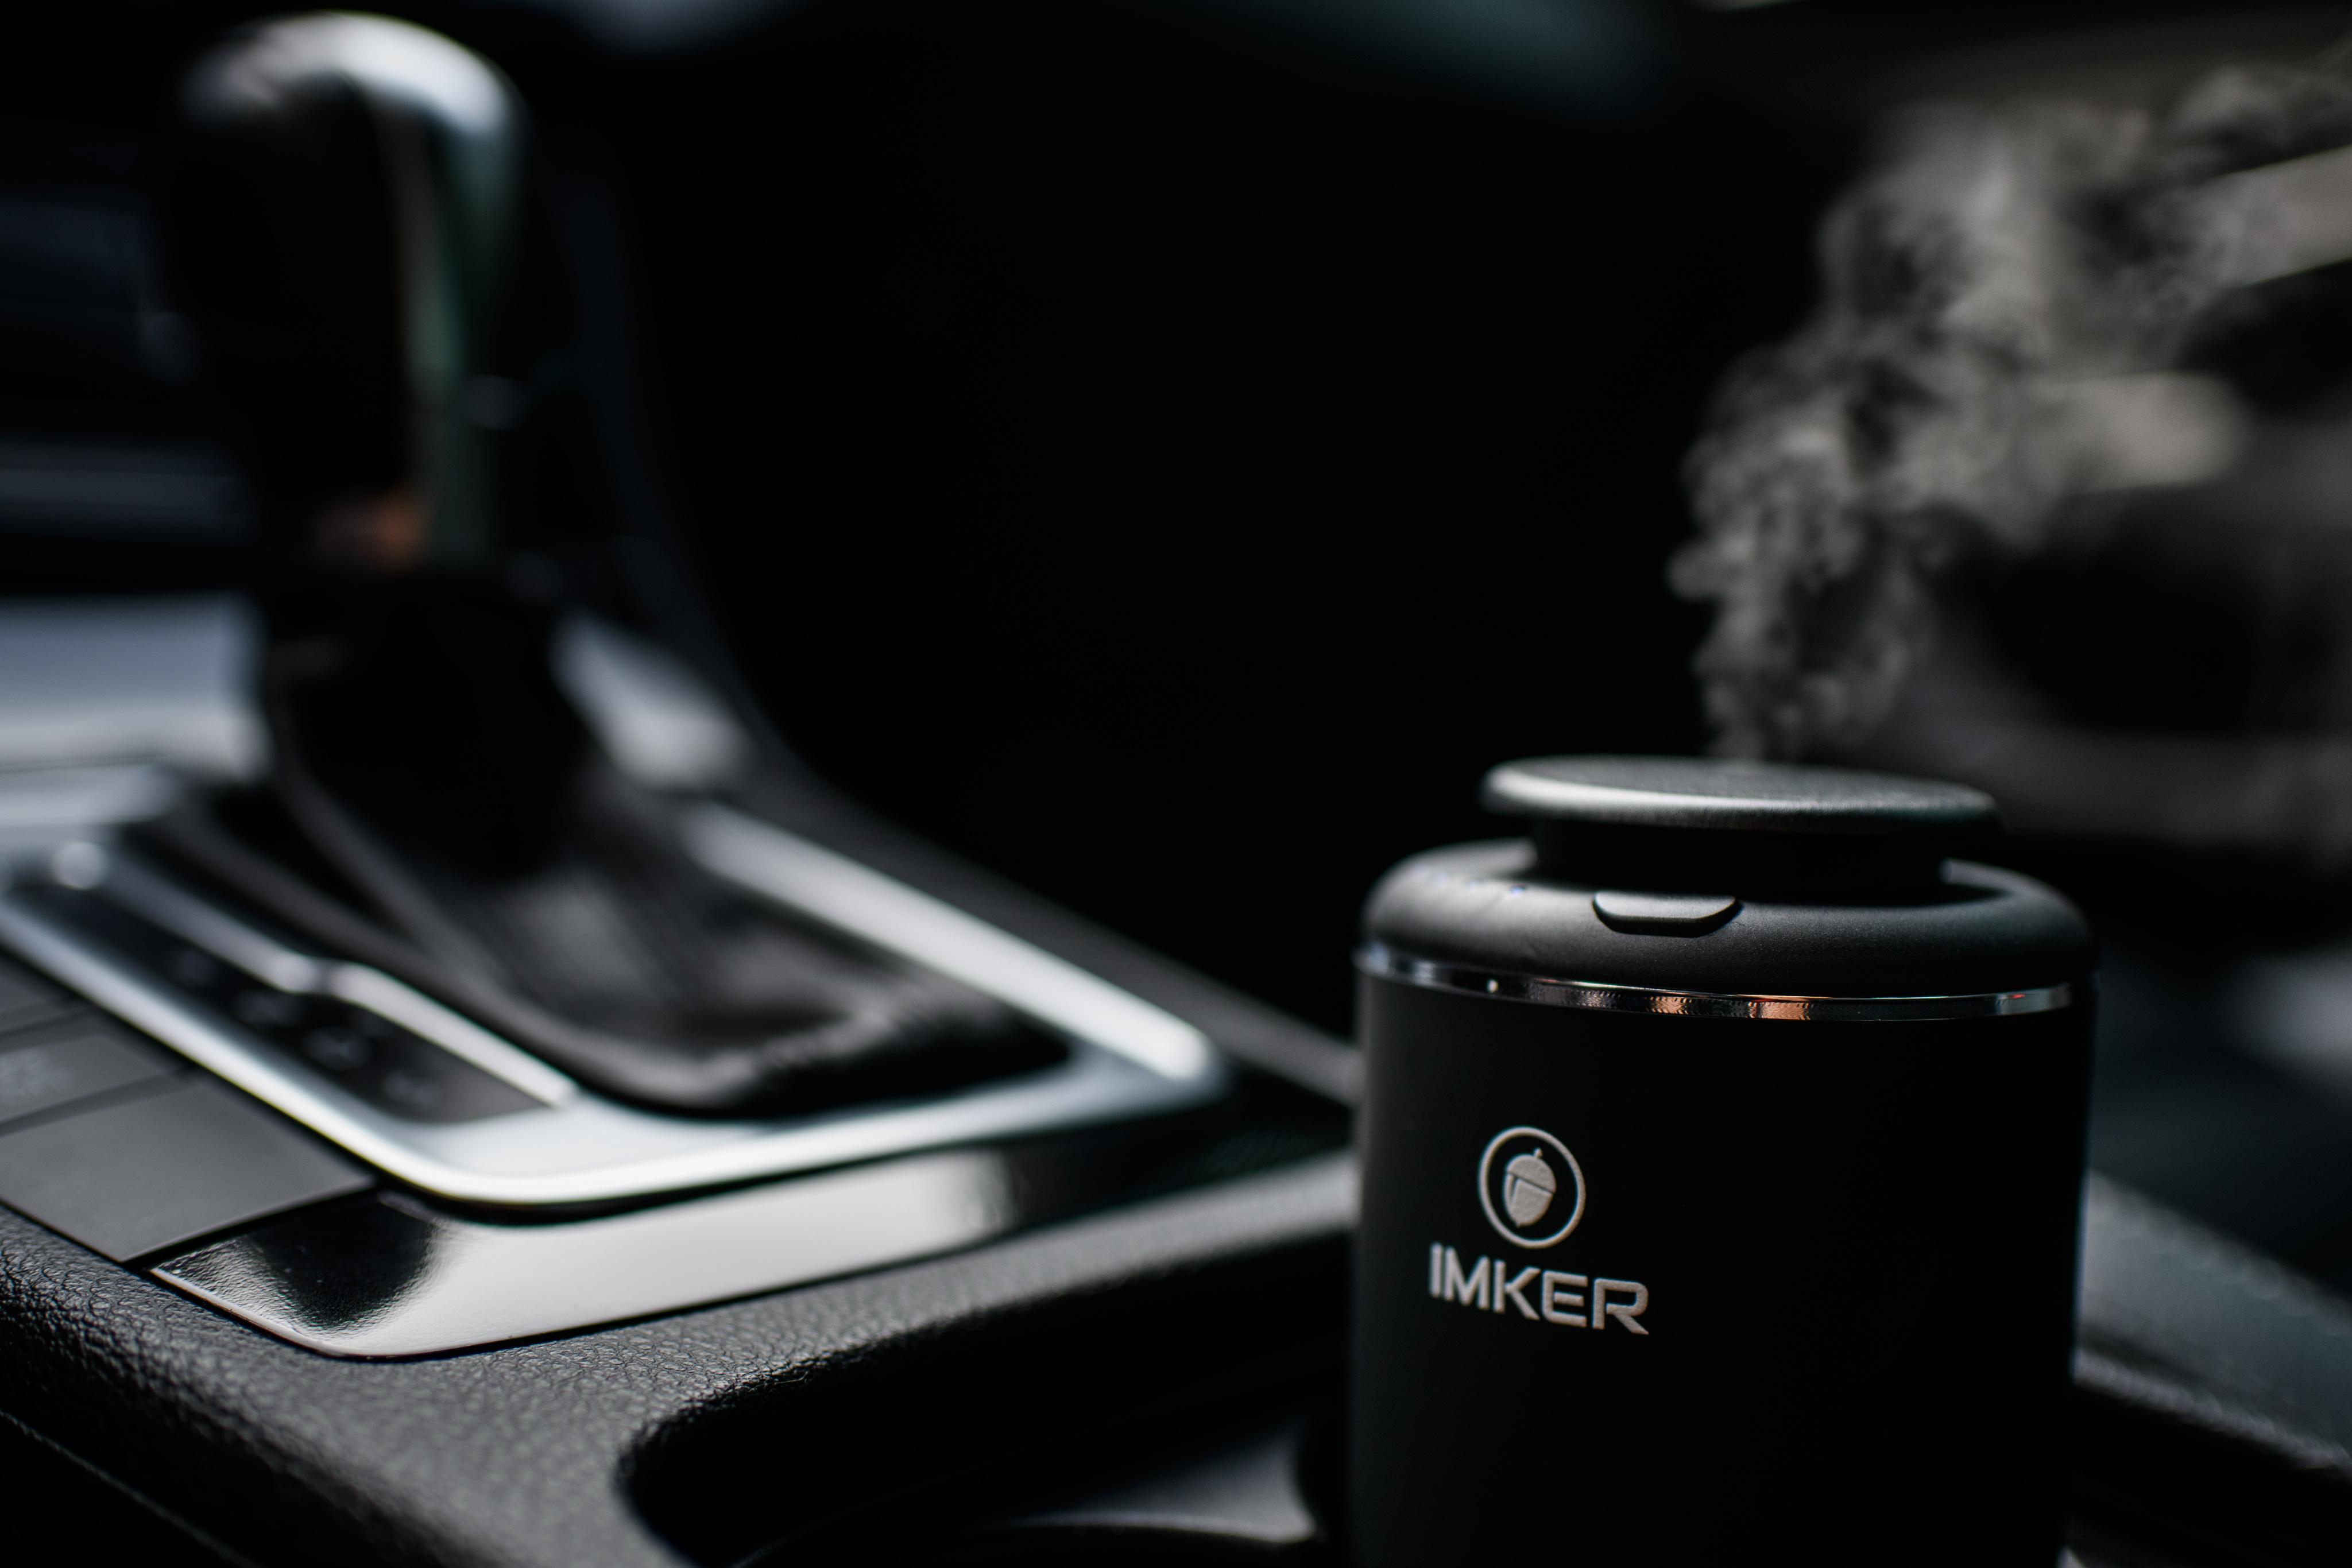 IMKER AromaLUX XS02 - odorizant auto profesional